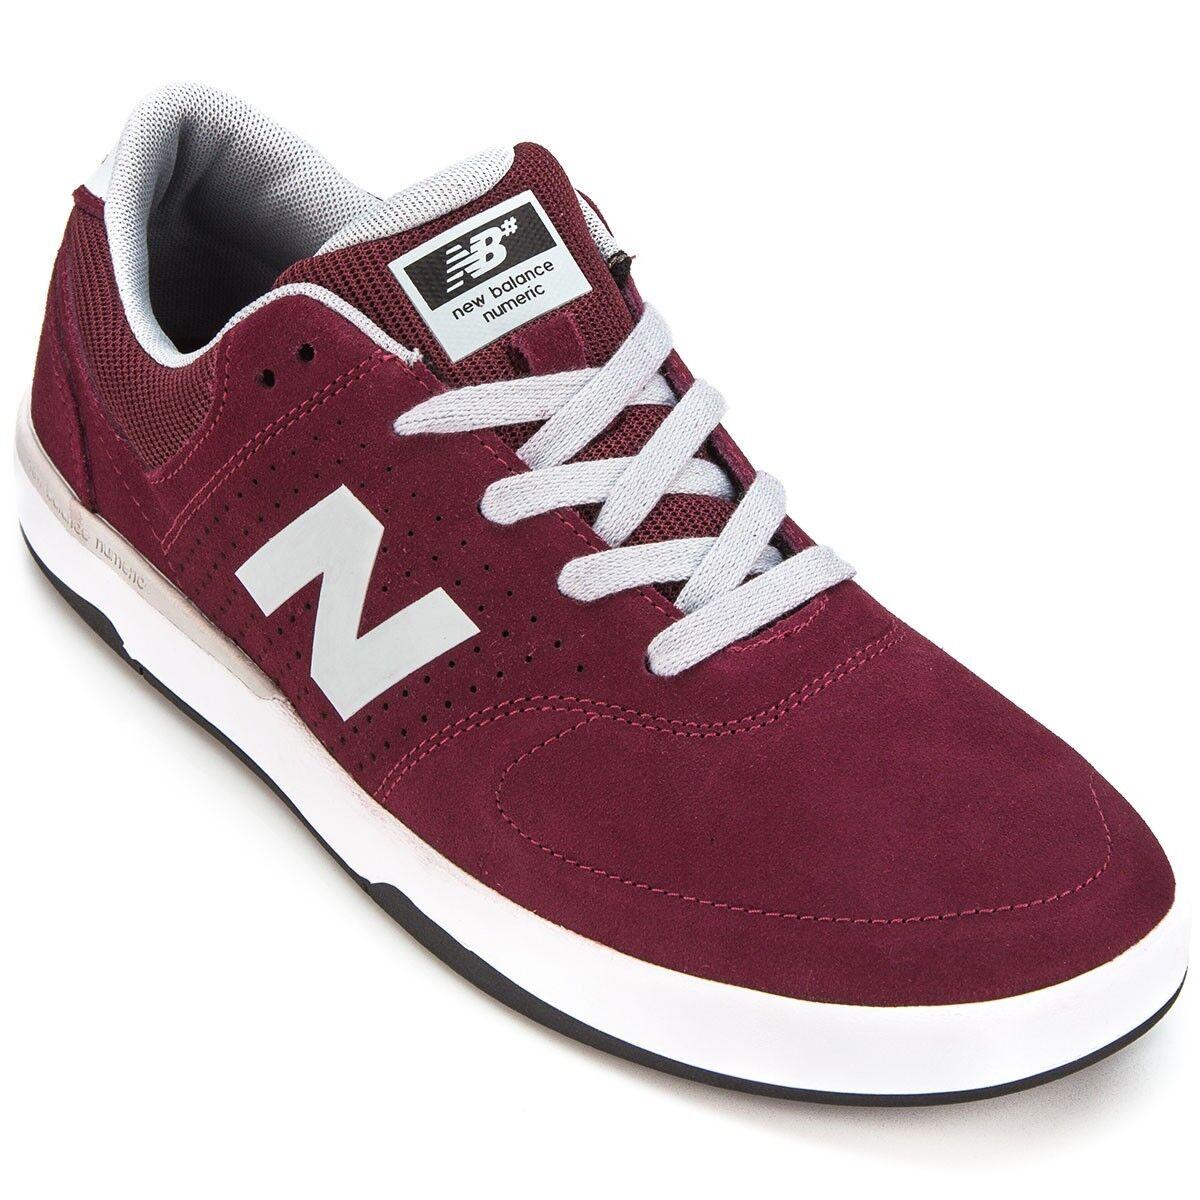 New Balance PJ Stratford 533 64 Schuhes UK8 EU42 JS13 64 533 4fafb8